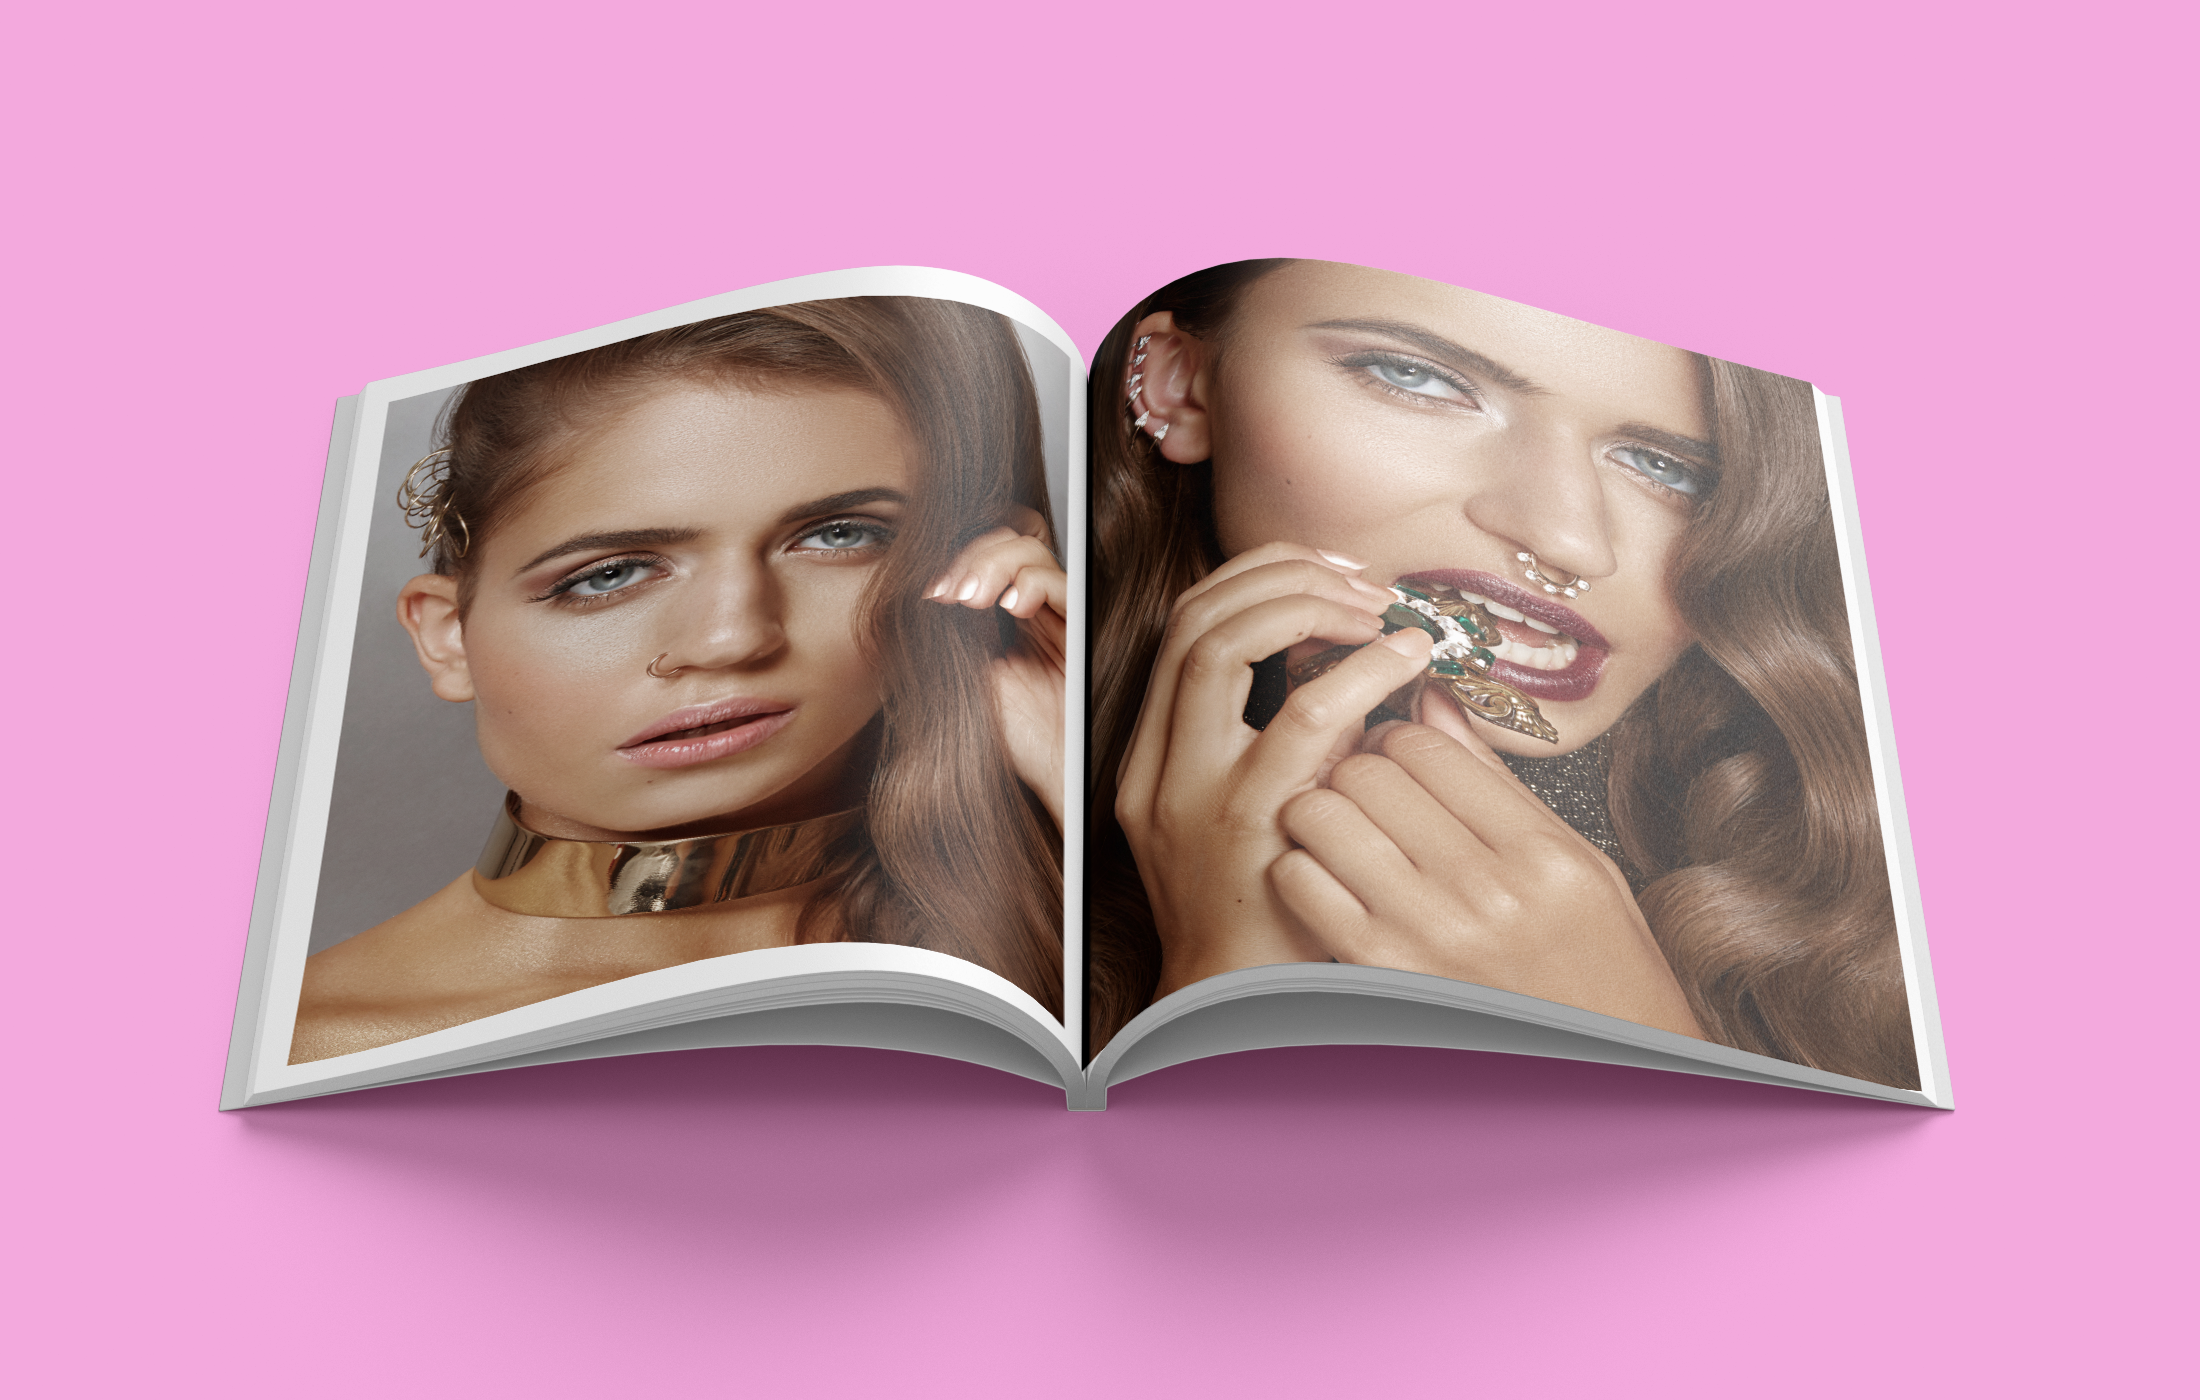 Model Citizen Magazine Issue 38, Macky Suson, Fashion Inclusion Now4.png